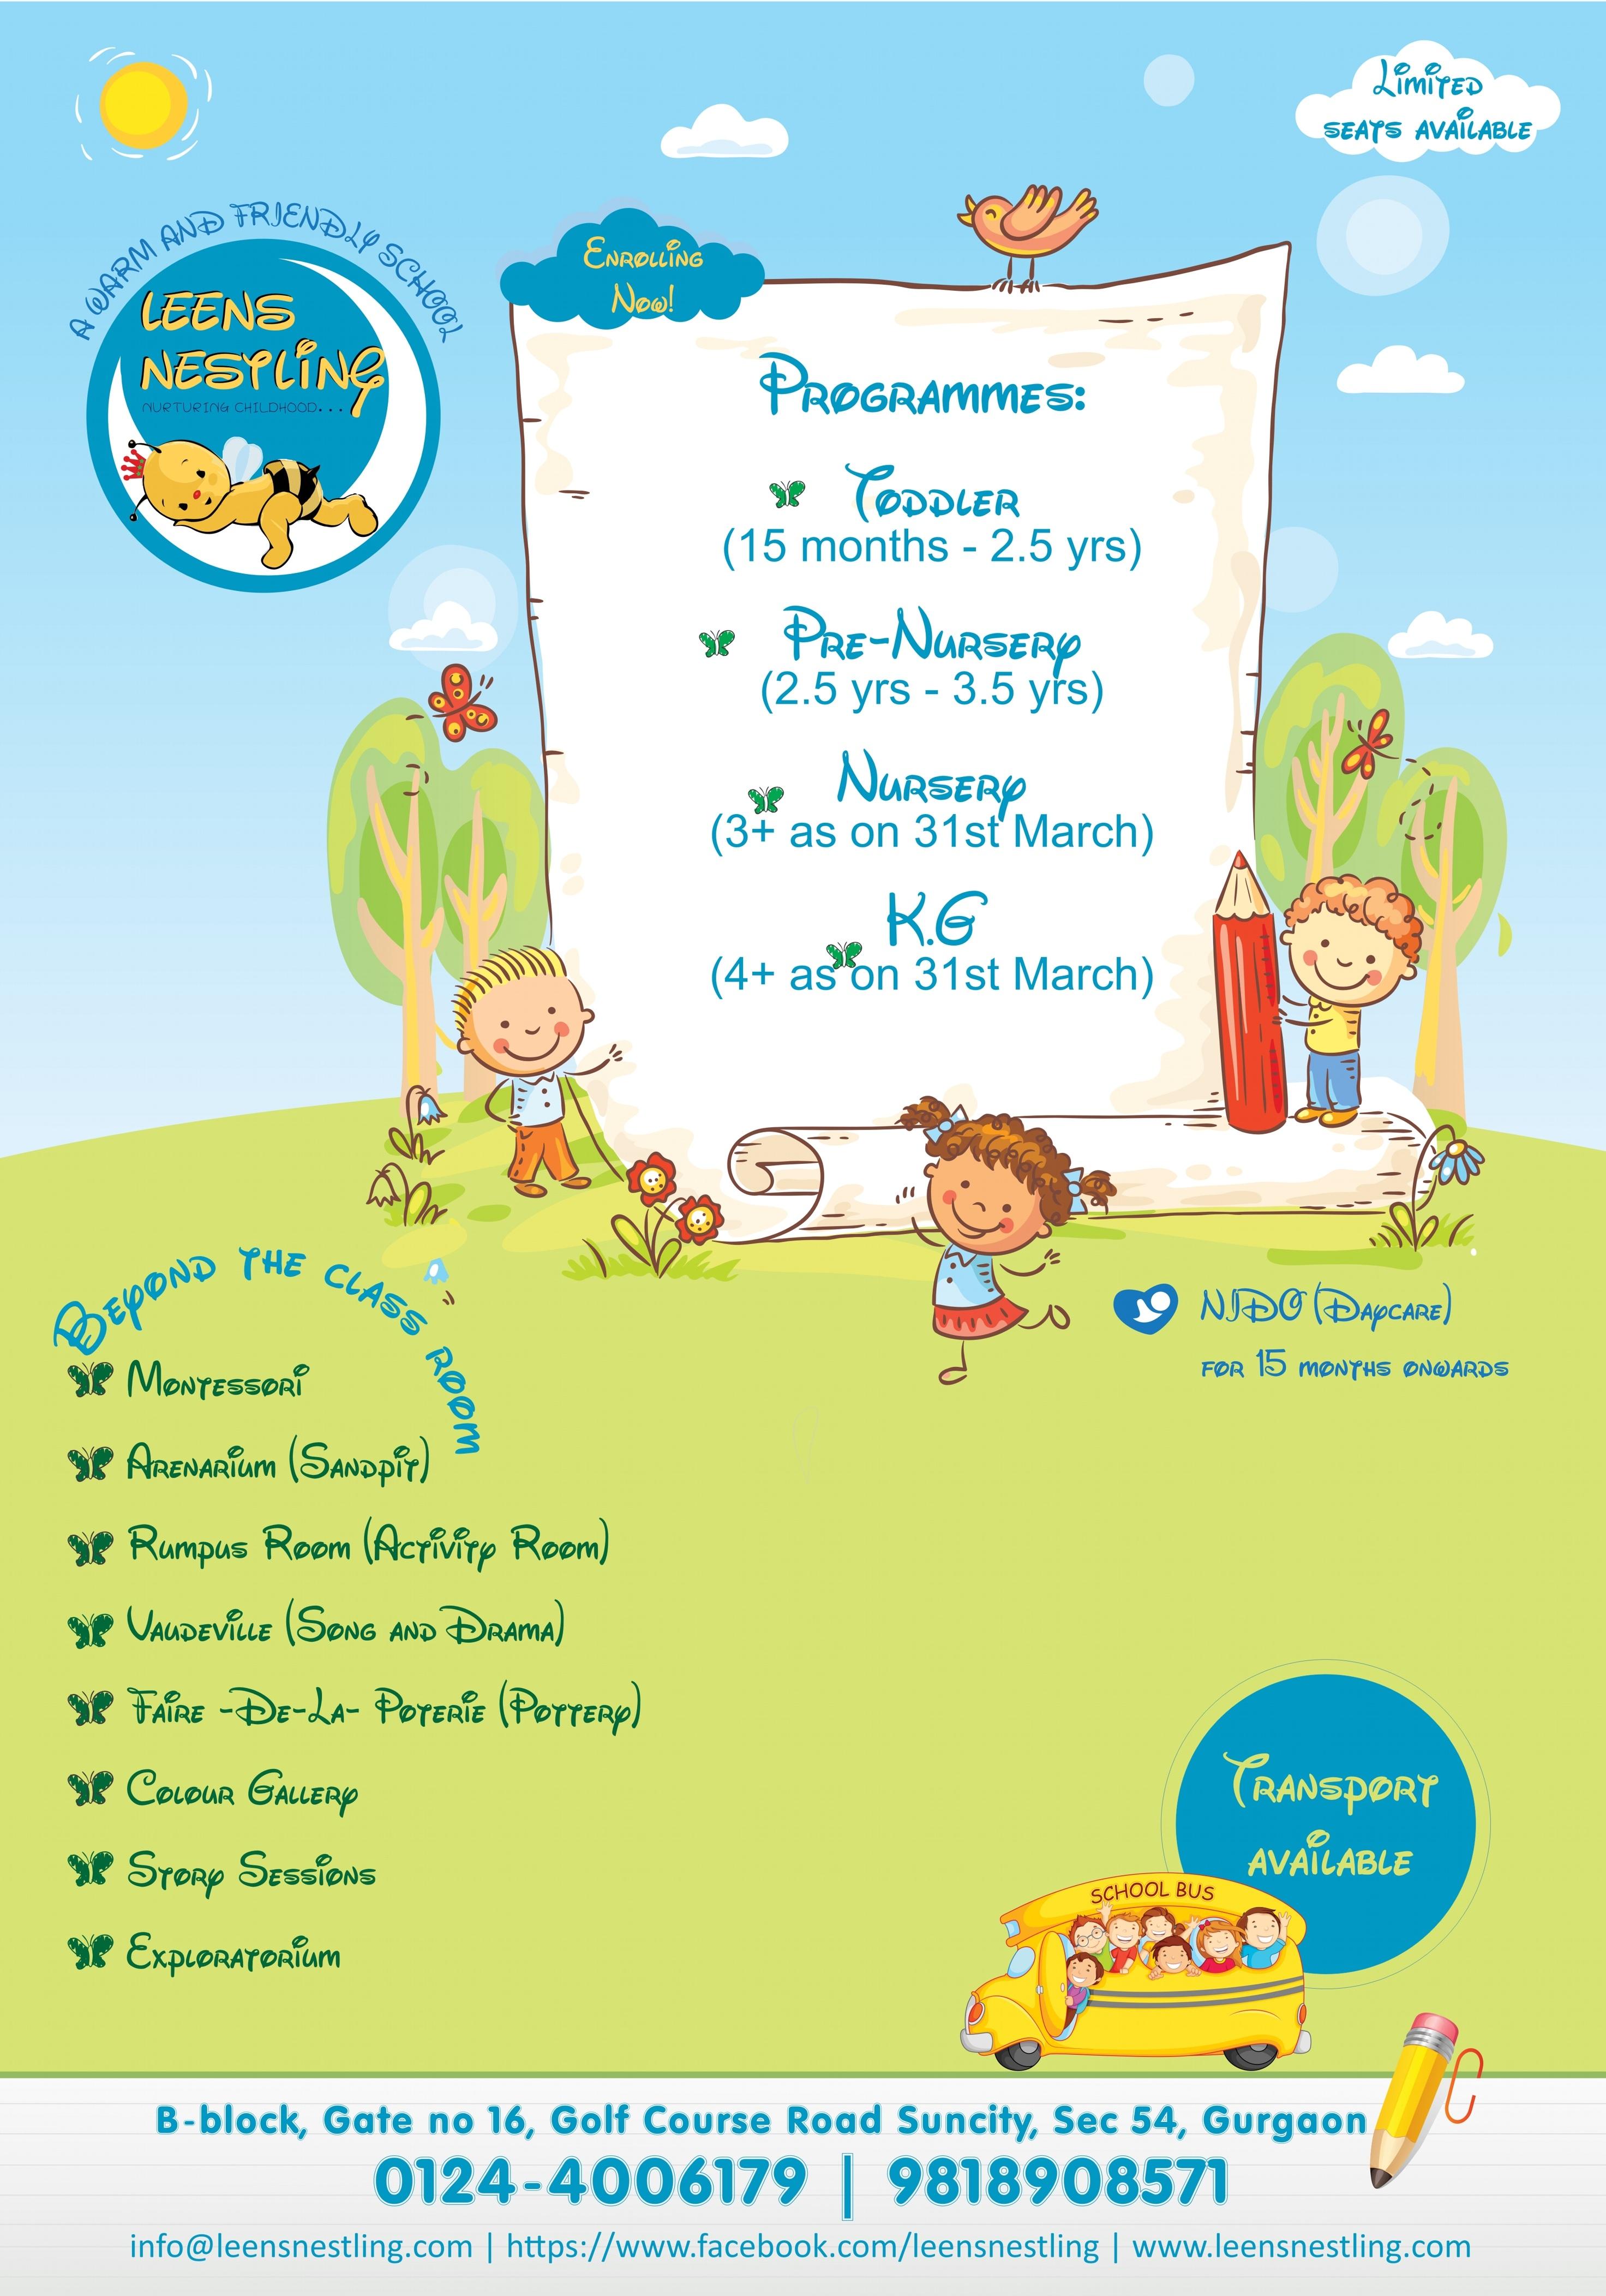 Preschool admission Gurgaon open in Leens Nestling - the best play school Gurgaon